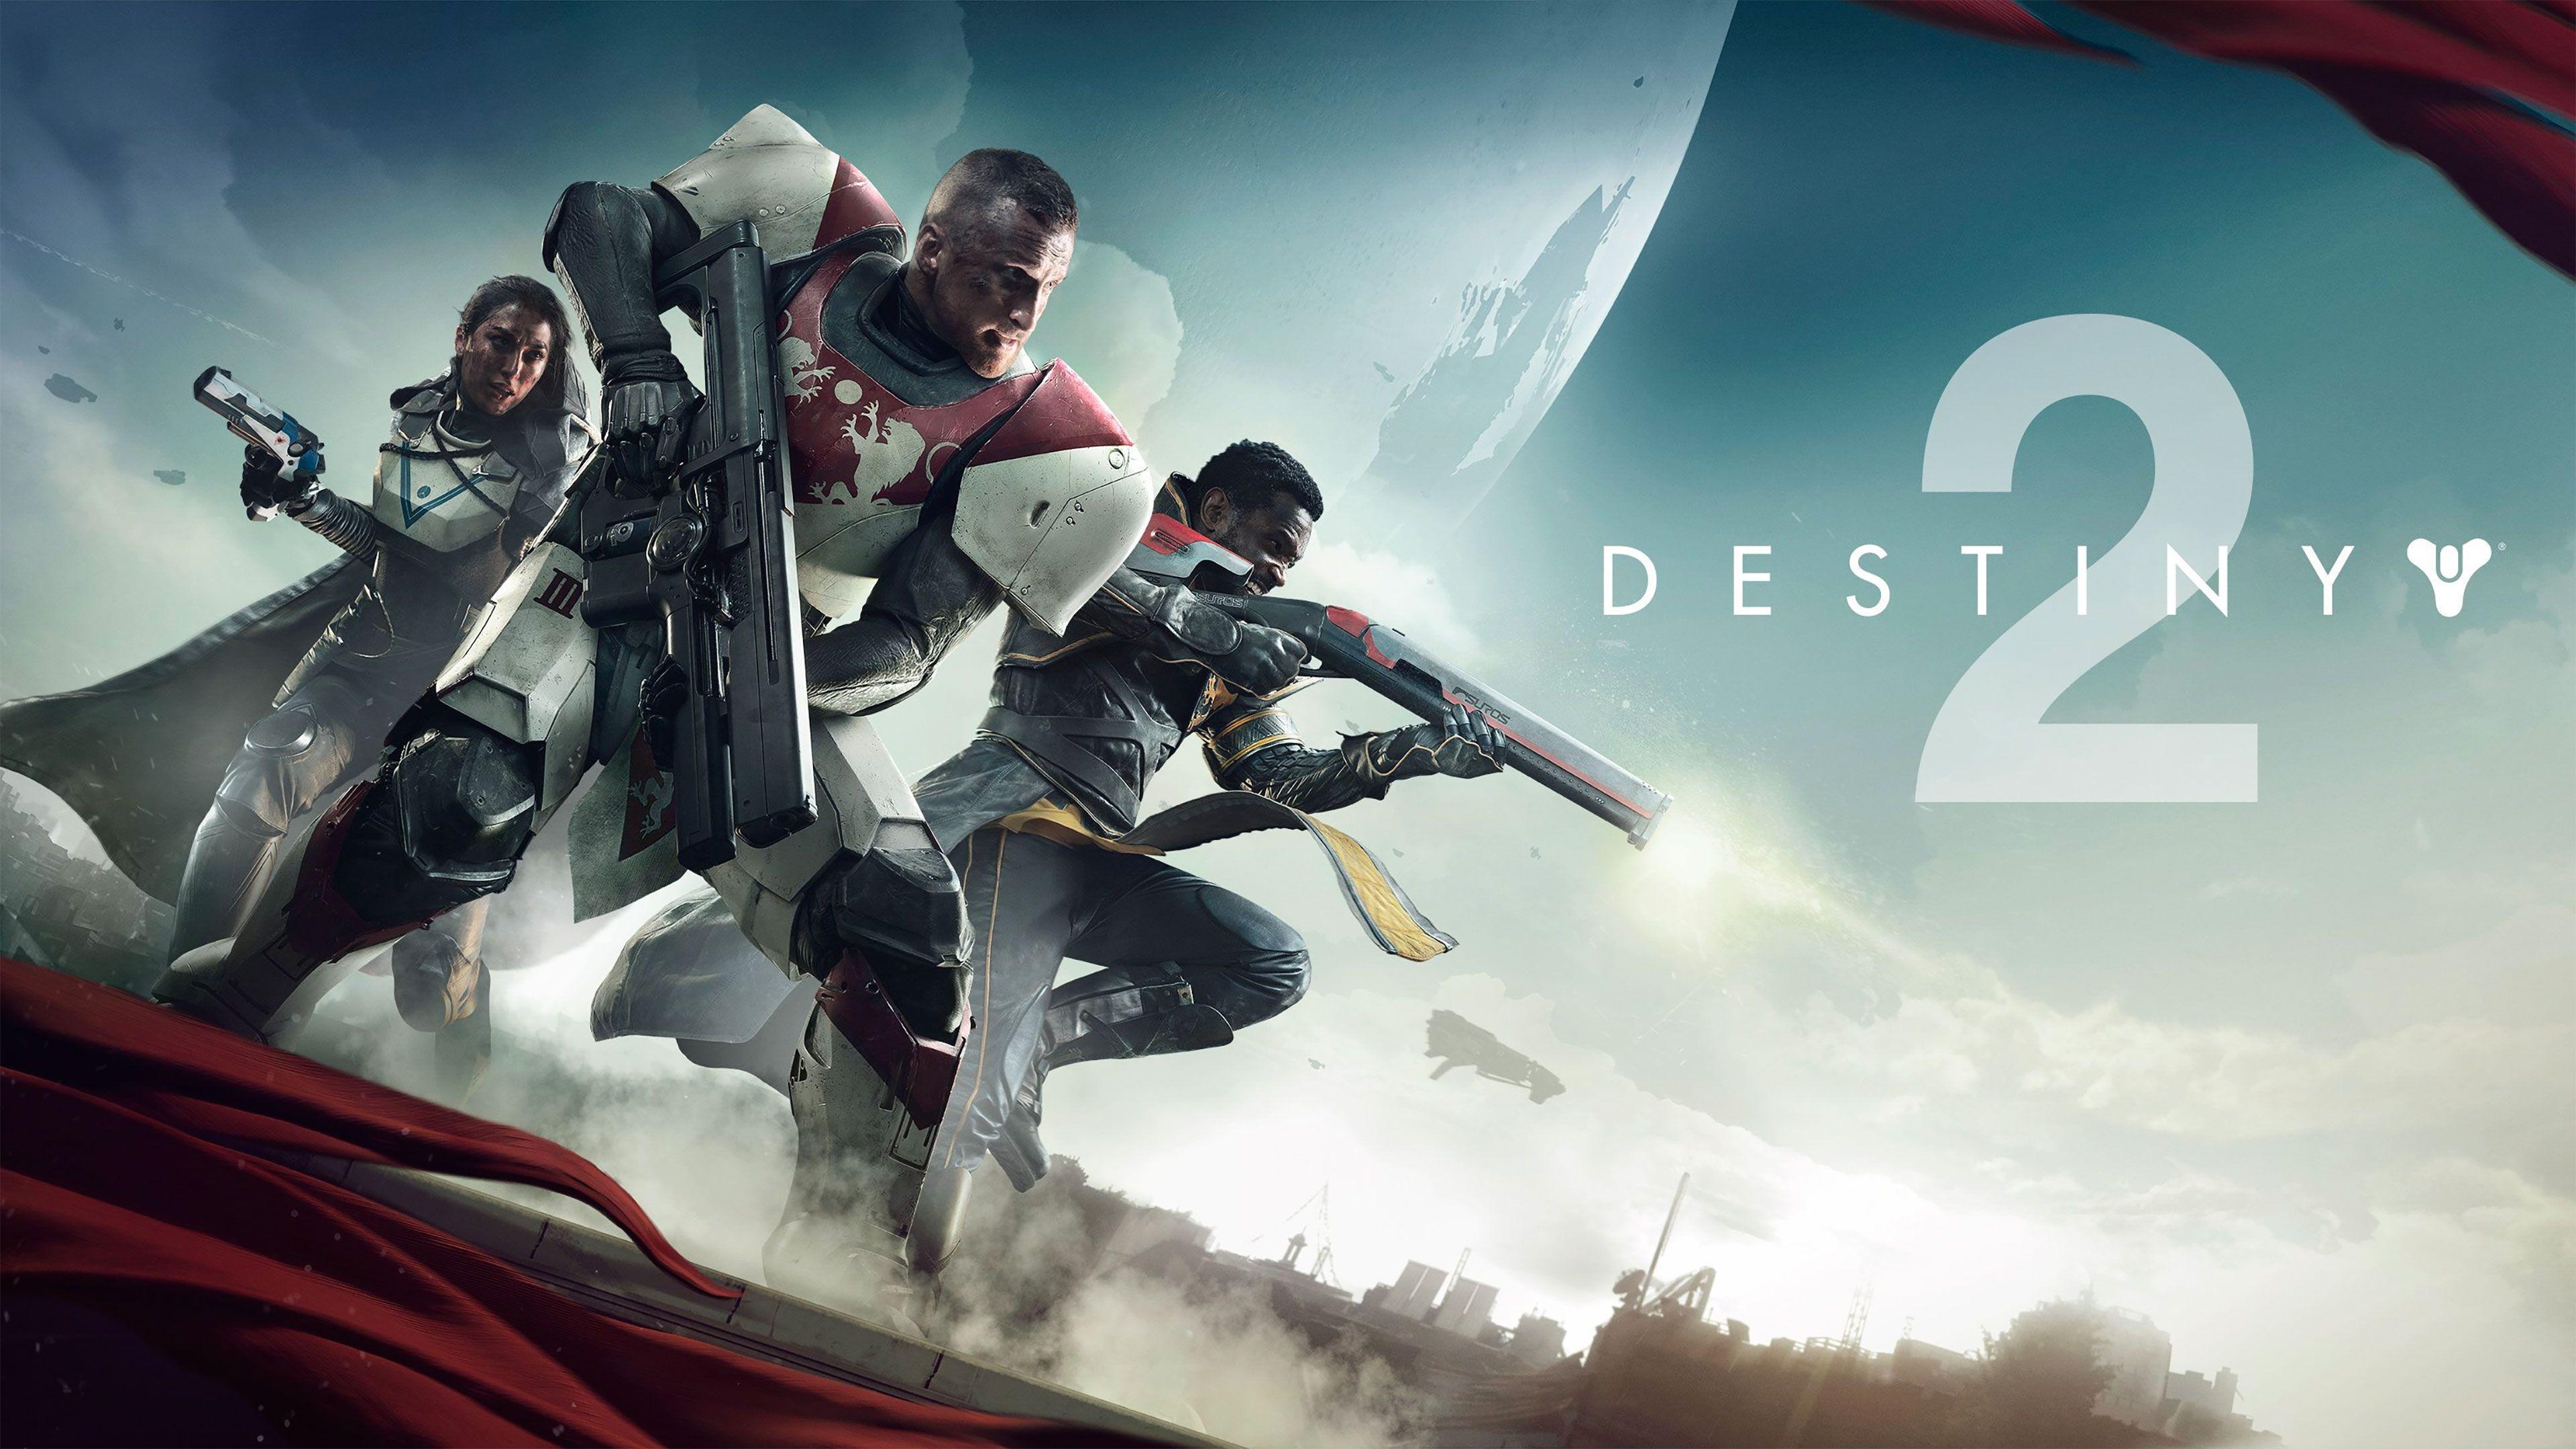 Destiny 2 4k Uhd Wallpapers Top Free Destiny 2 4k Uhd